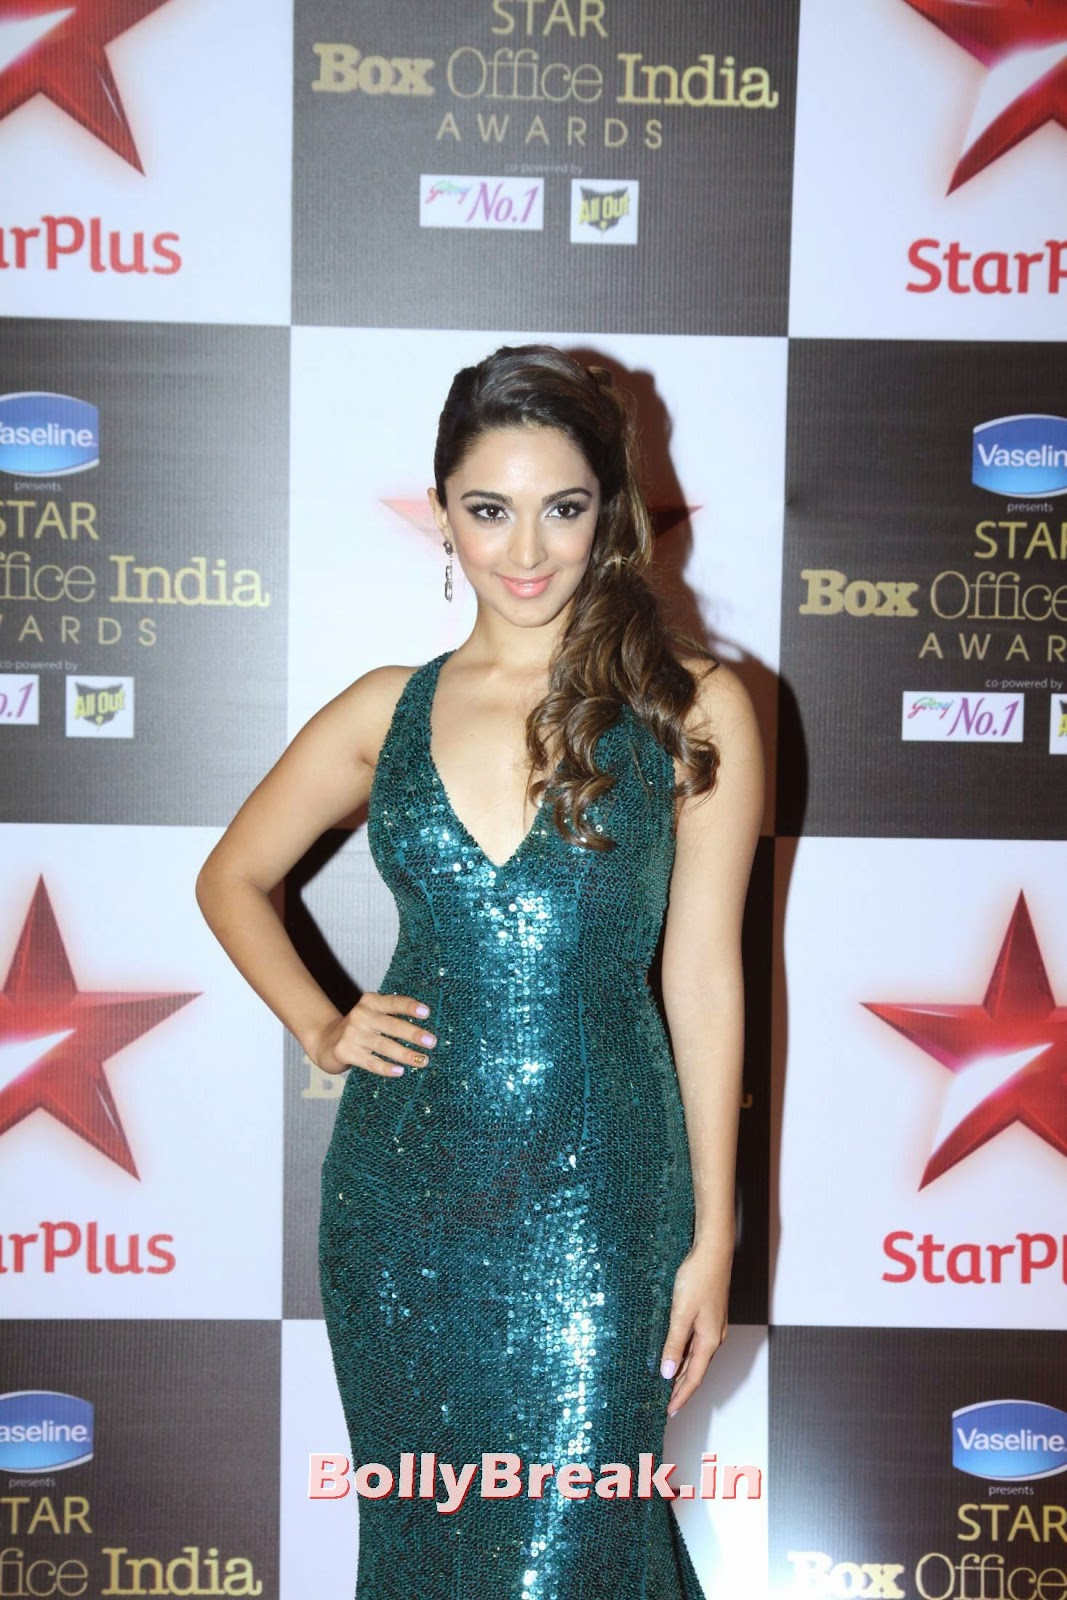 Kiara Advani in Sexy Gown, Kiara Advani at Star Box Office India Awards in Sexy Gown